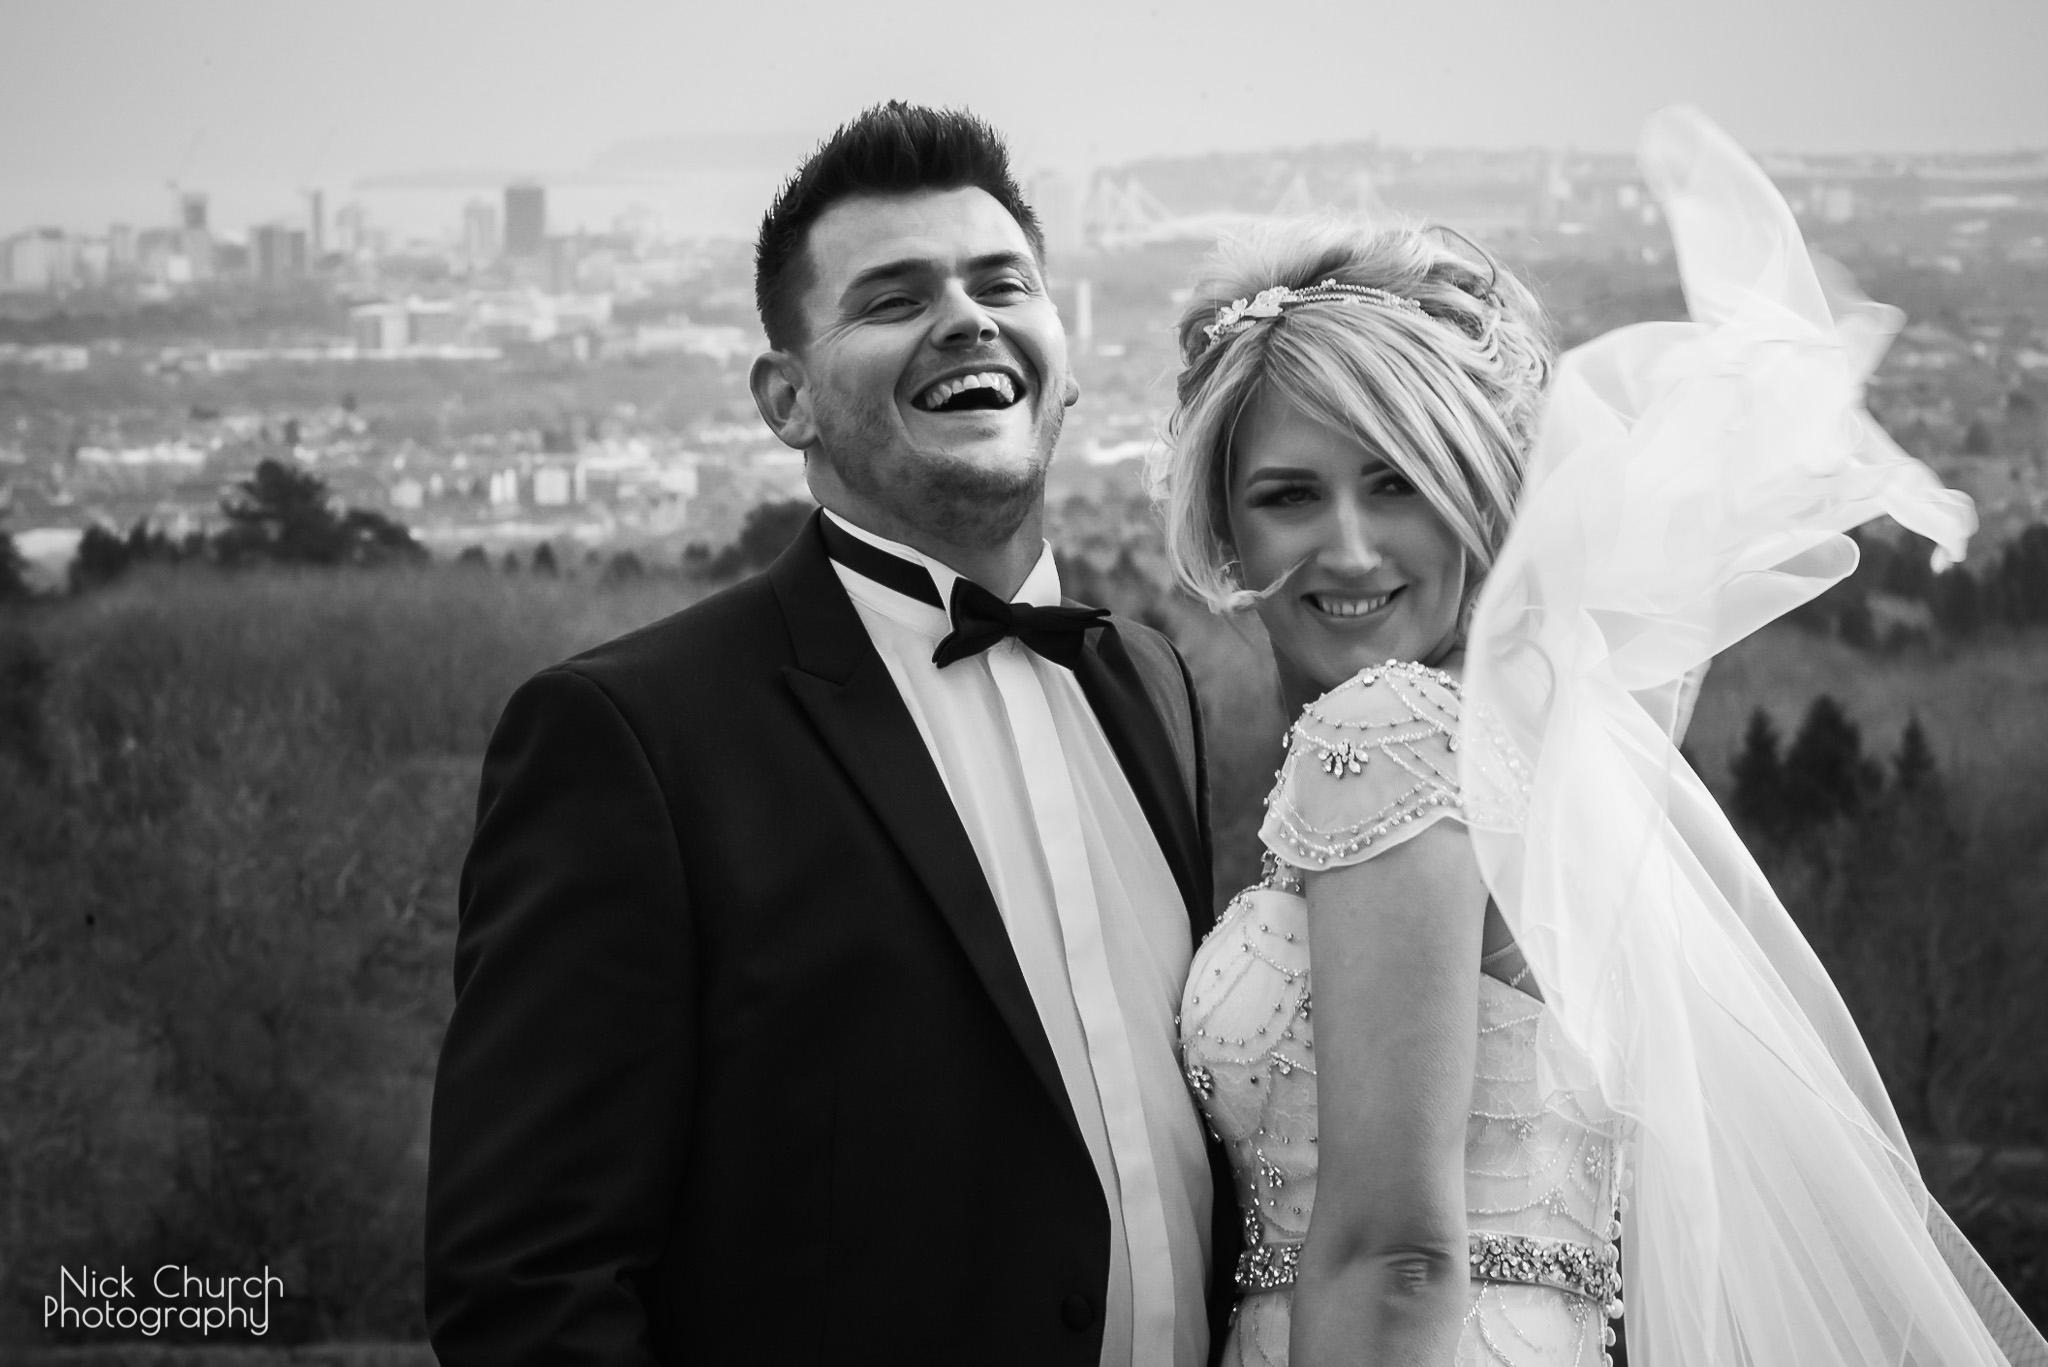 NC-20180317-stacy-and-mike-wedding-1340.jpg